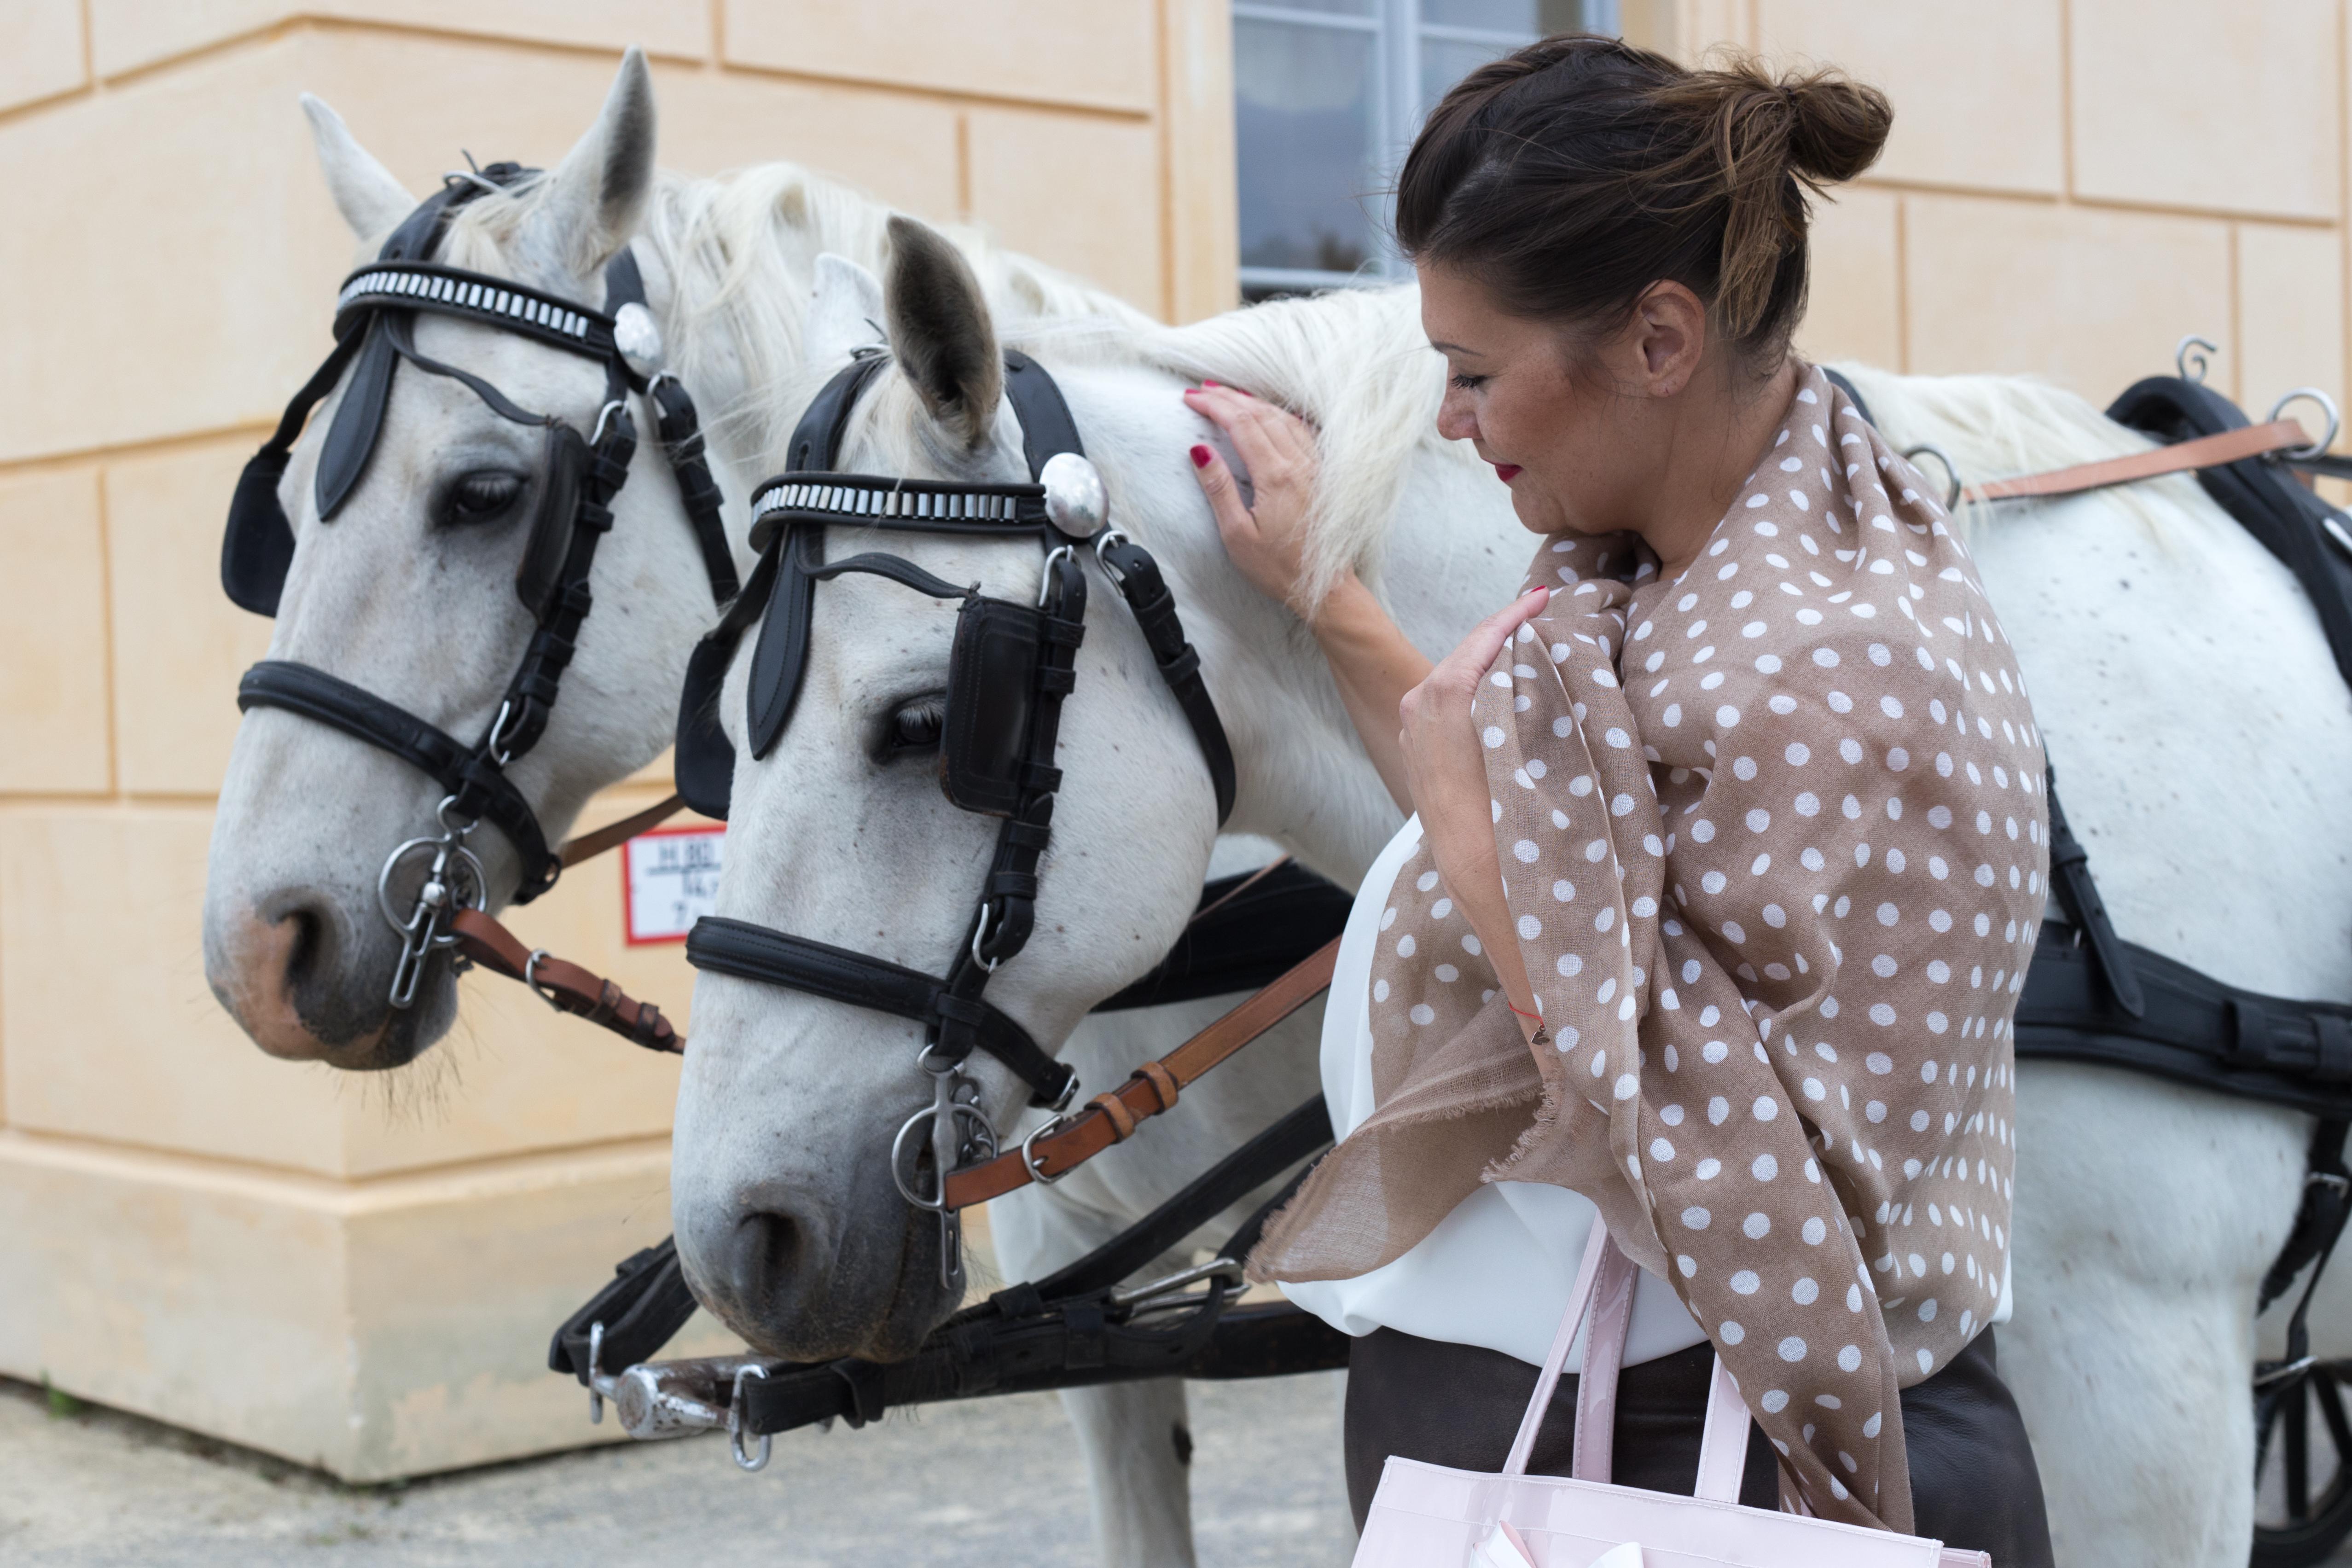 kardiaserena vintage look leder skirt dots scarf maheela ted baker schloss hof igersaustria peeptoes caprice horses